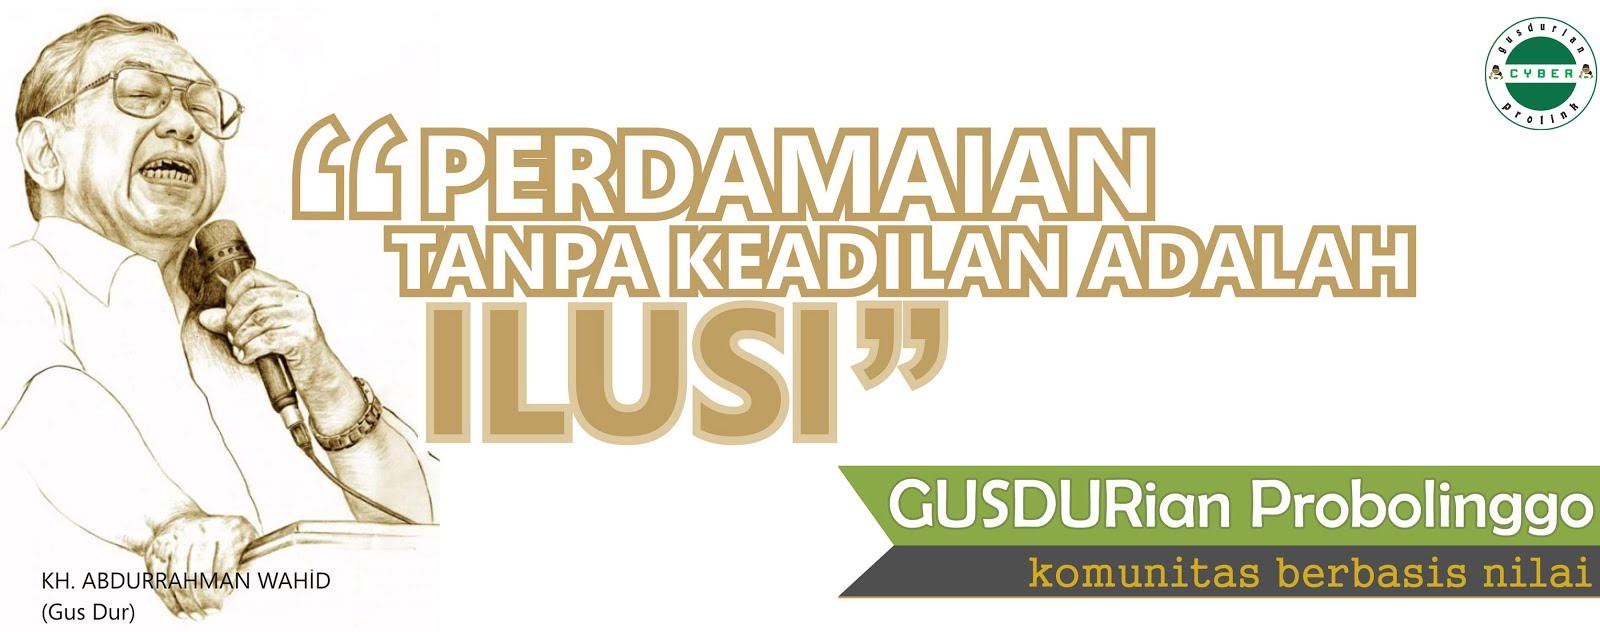 GUSDURian Probolinggo